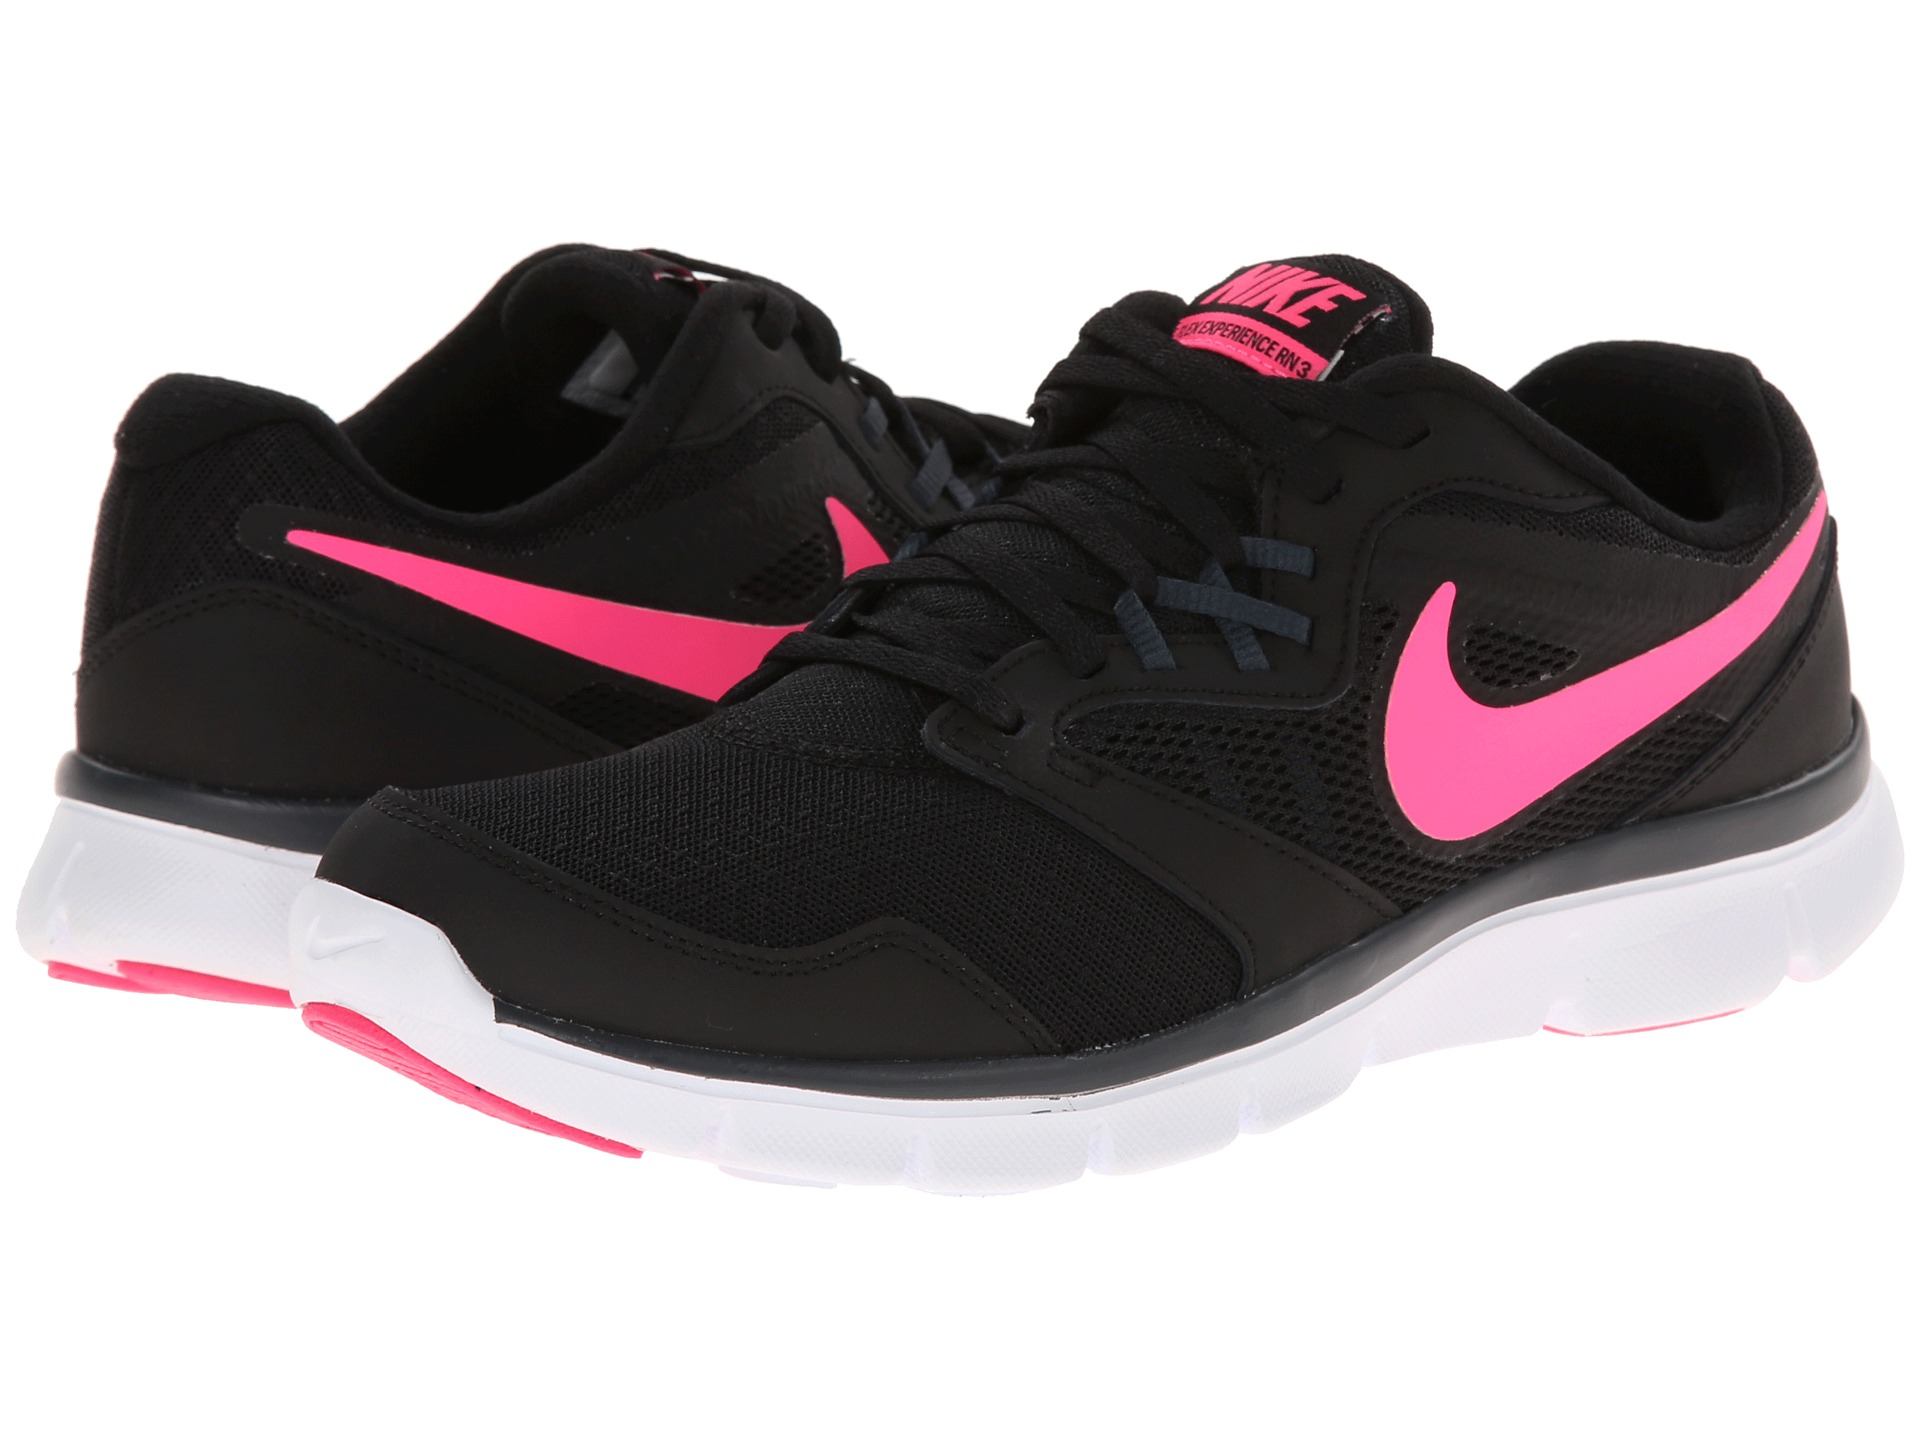 Womens Nike Running Shoes Zappos 20